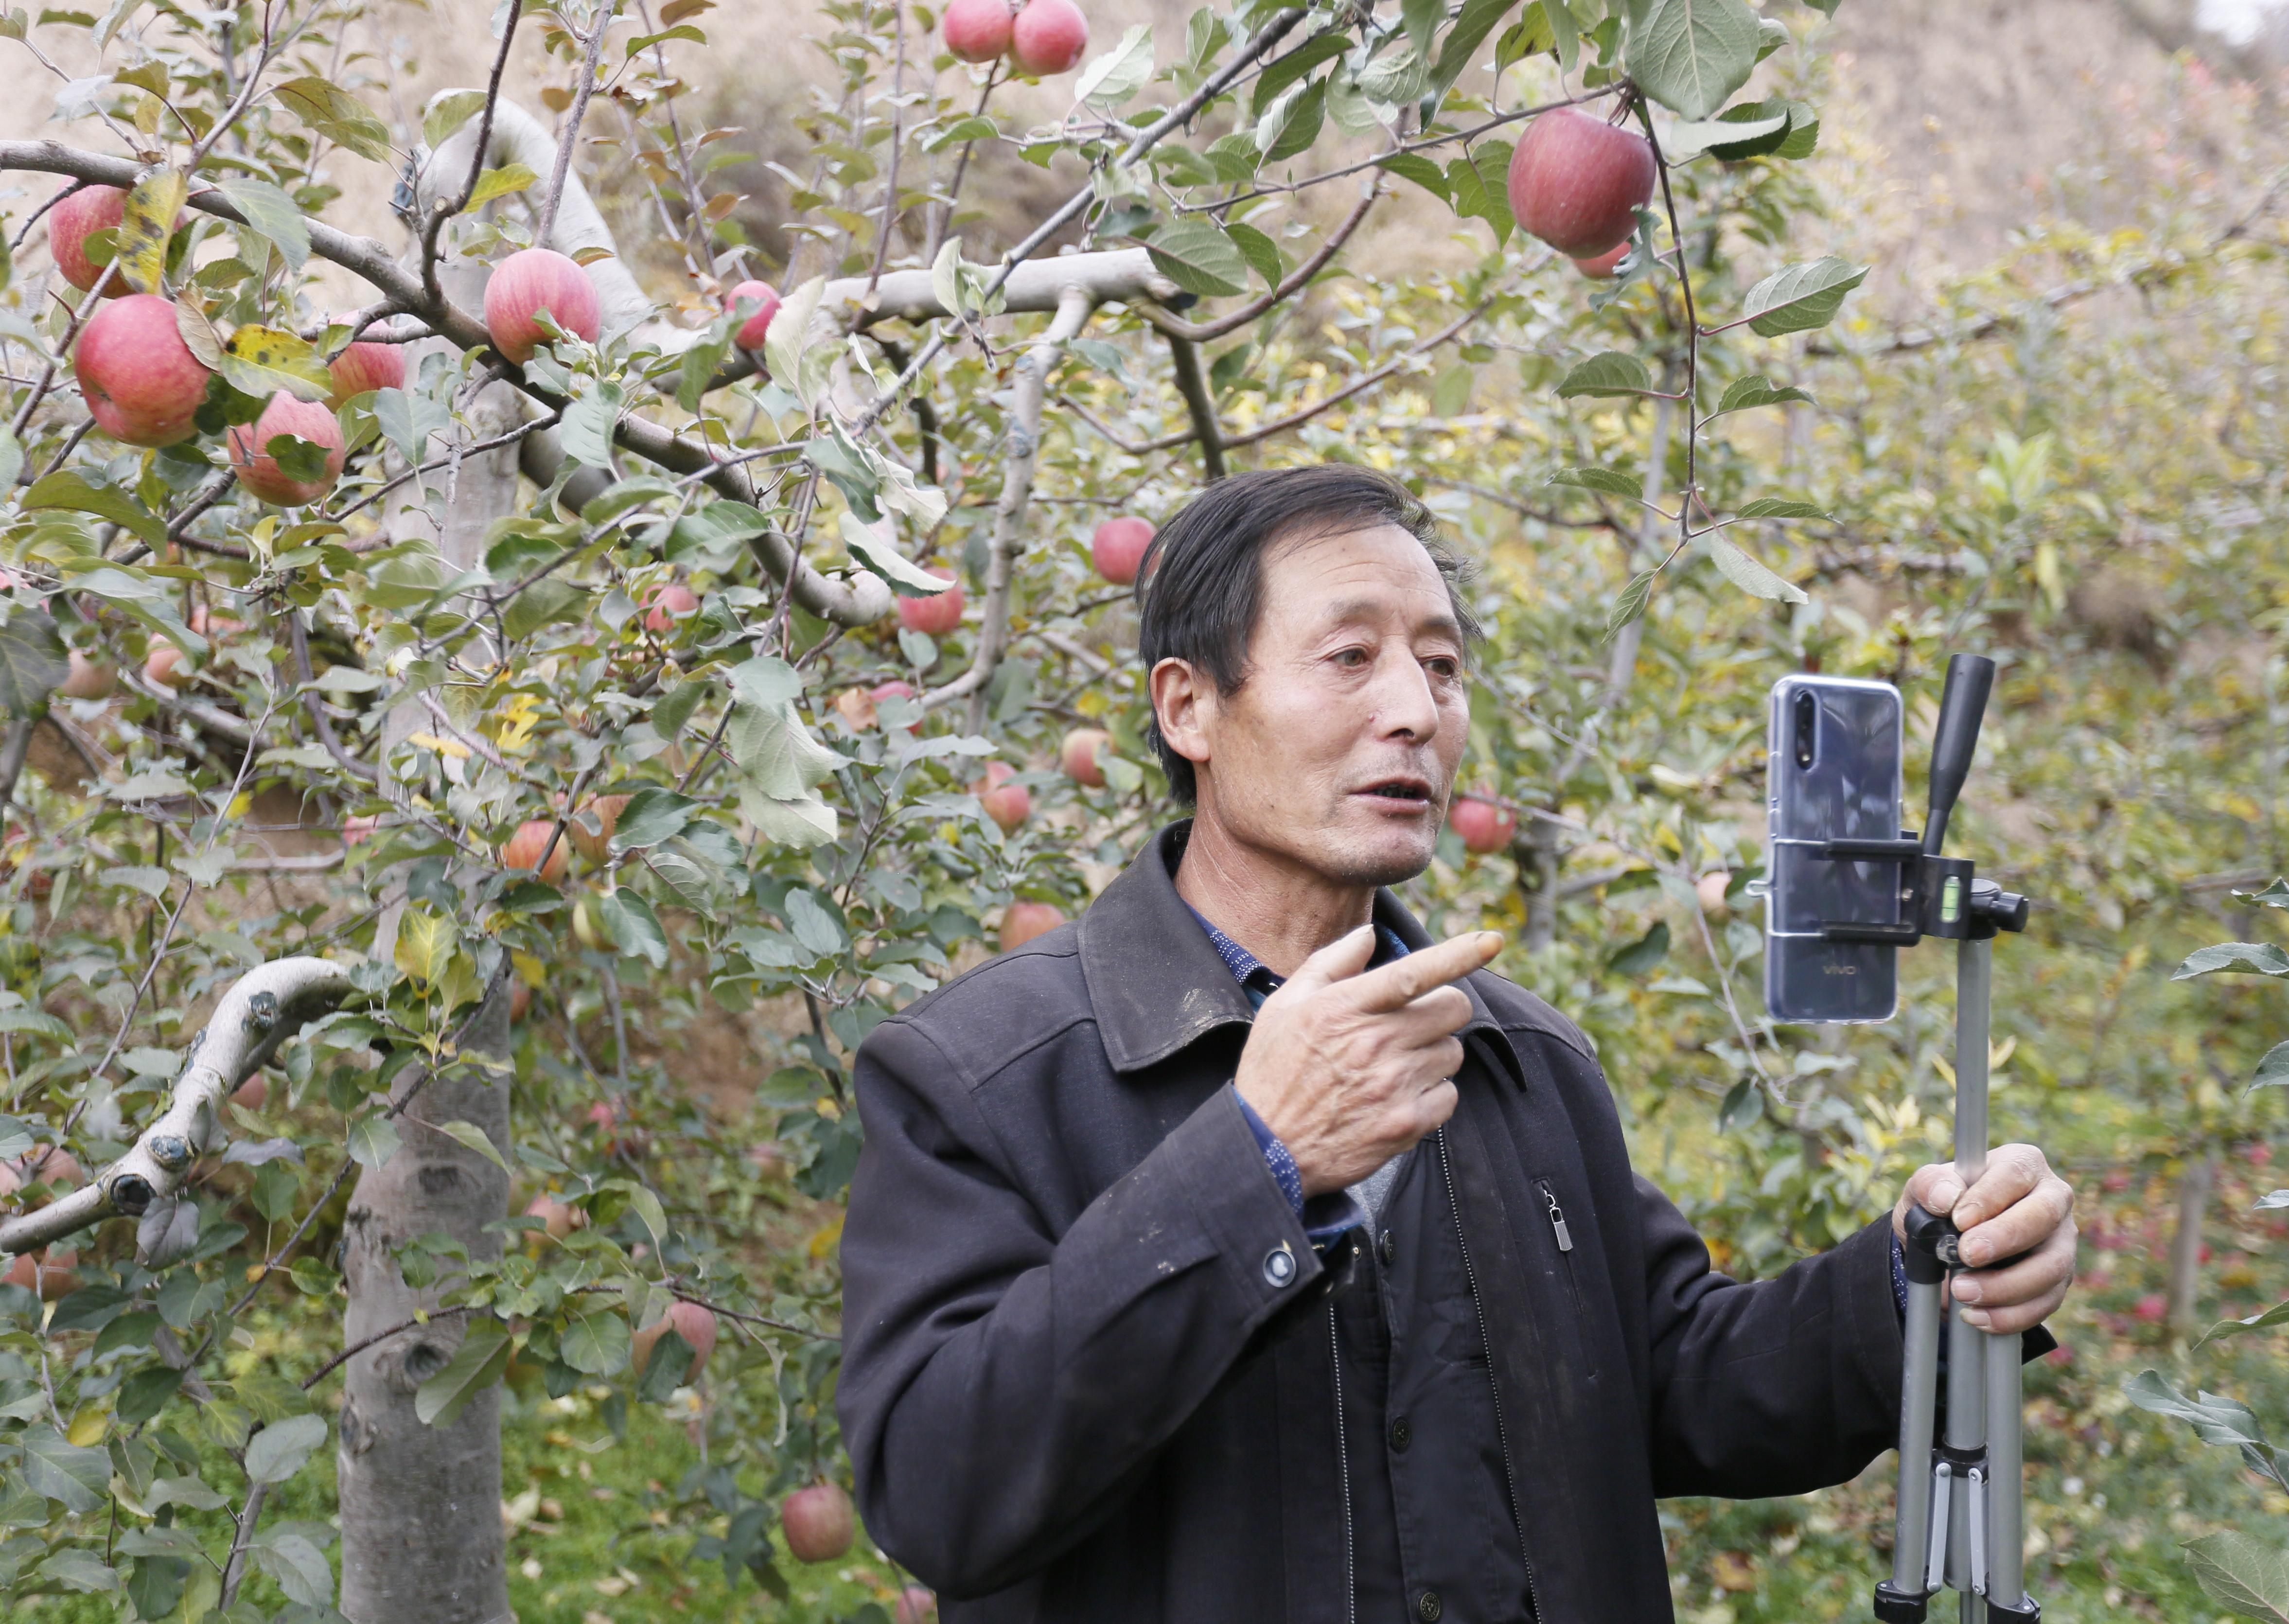 Livestreaming-ecommerce-filantropi-alibaba-2020-marketing-for-good